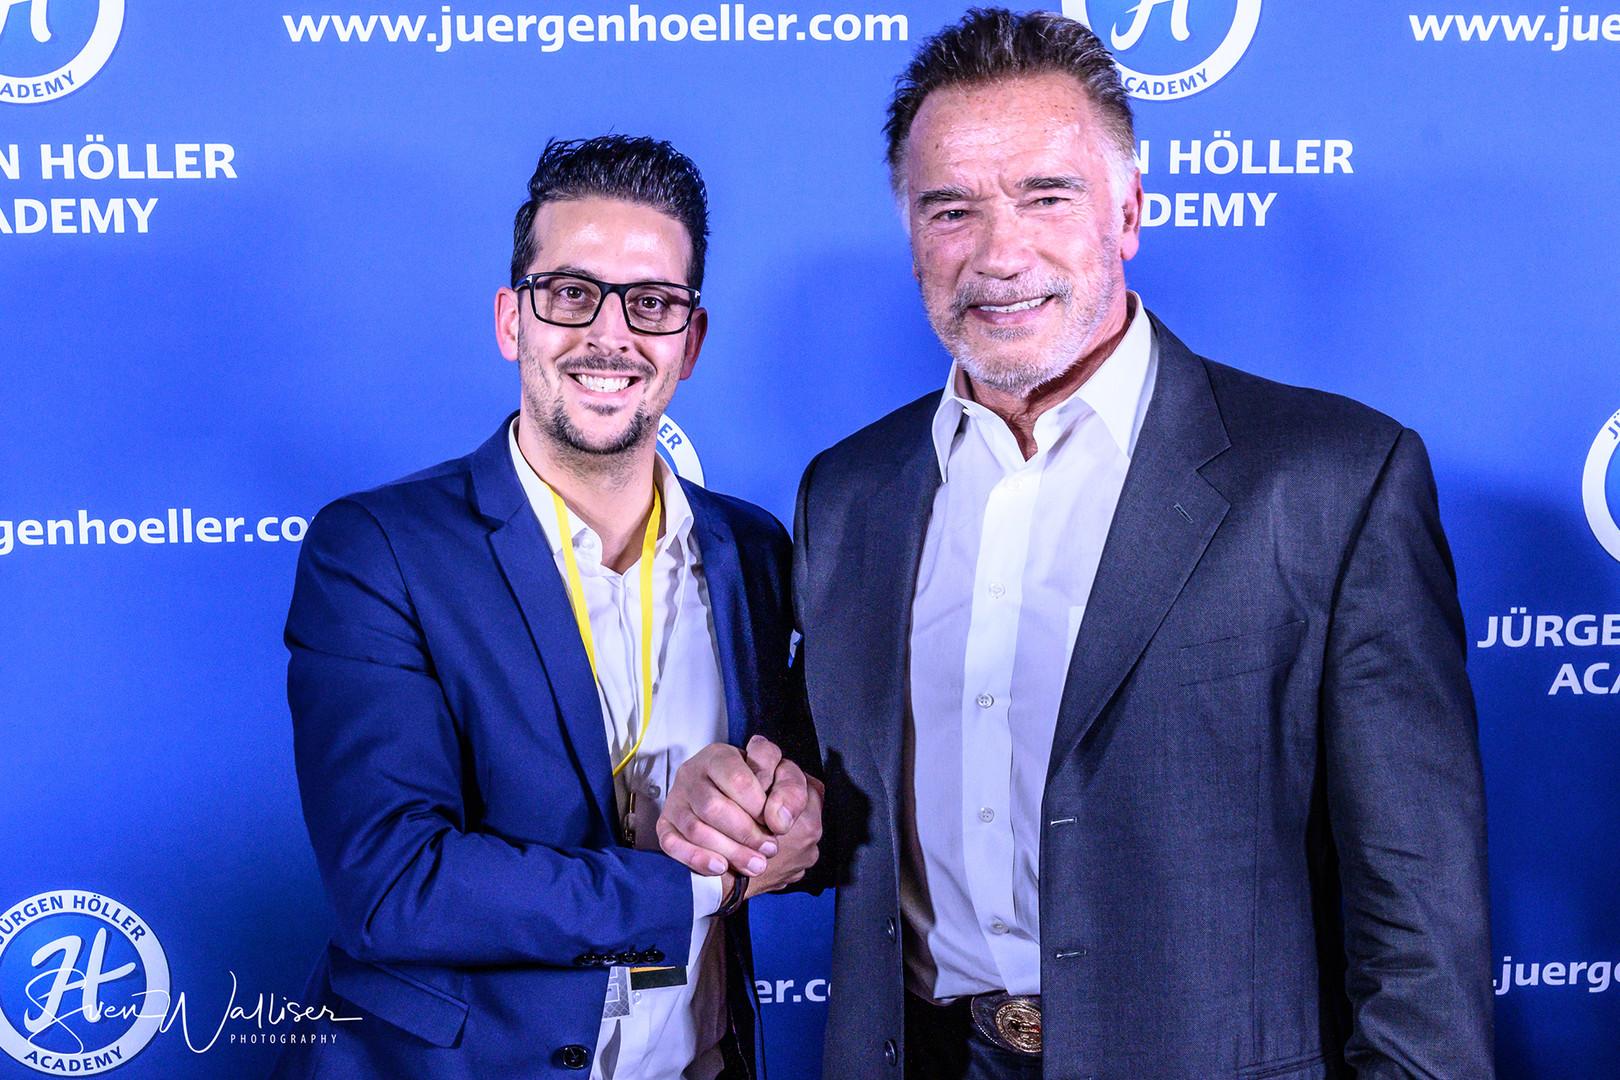 Arnold Schwarzenegger and me